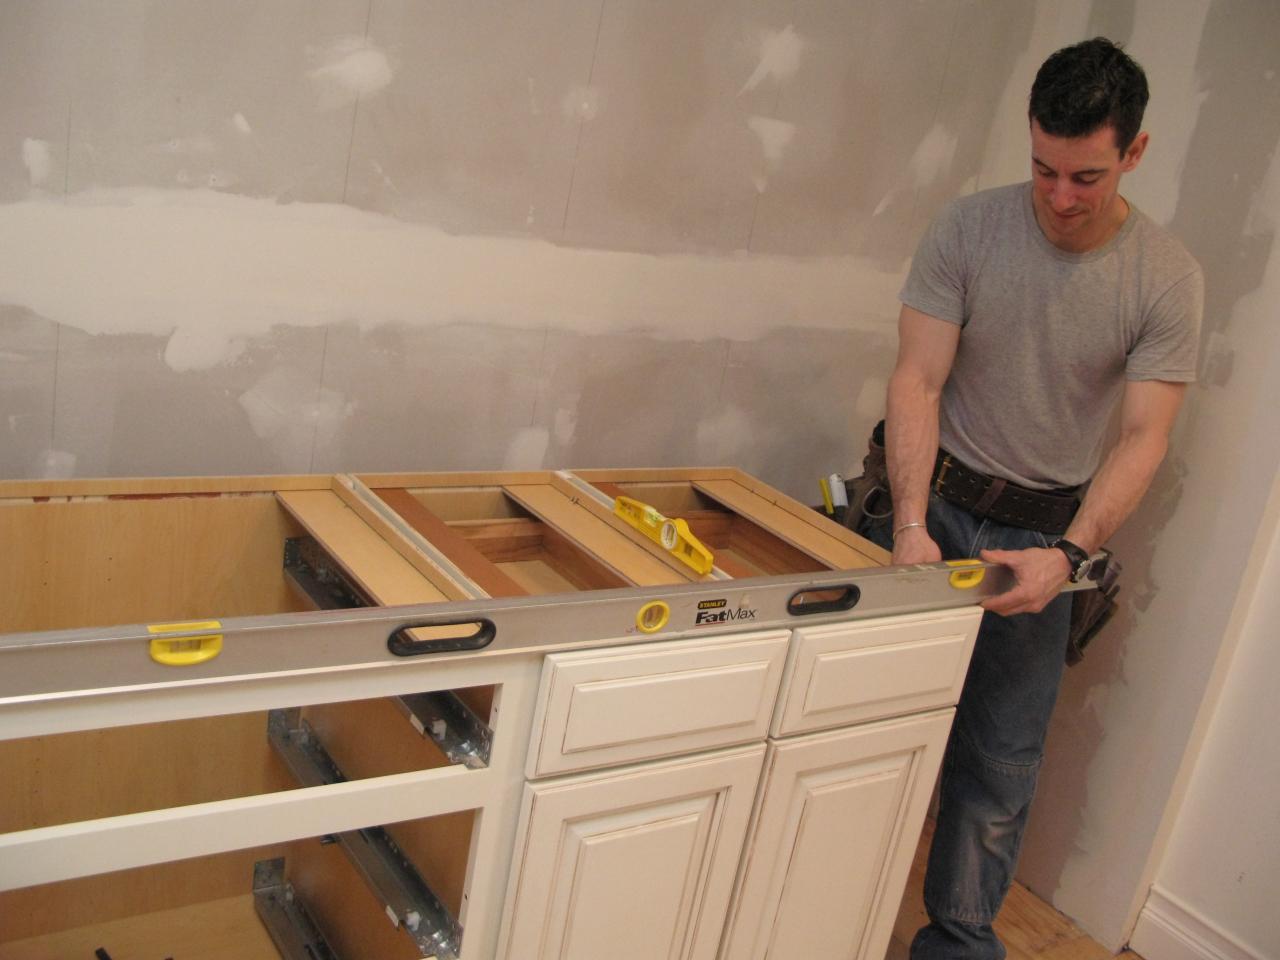 thomasville_cabinets - Kitchen Cabinets Frames